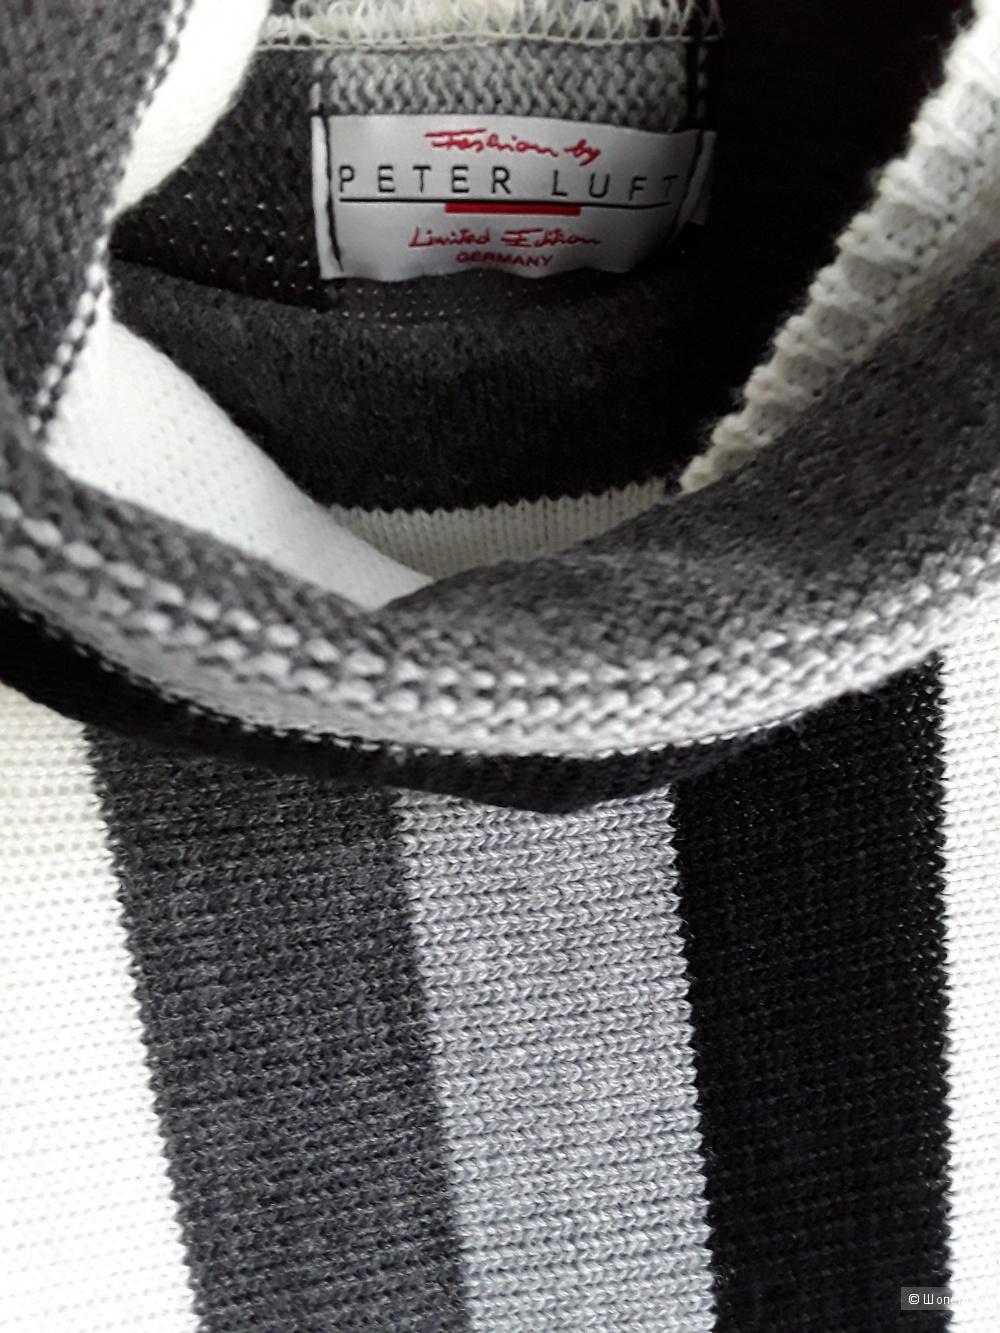 Длинный свитер Peter Luft размер 48-50